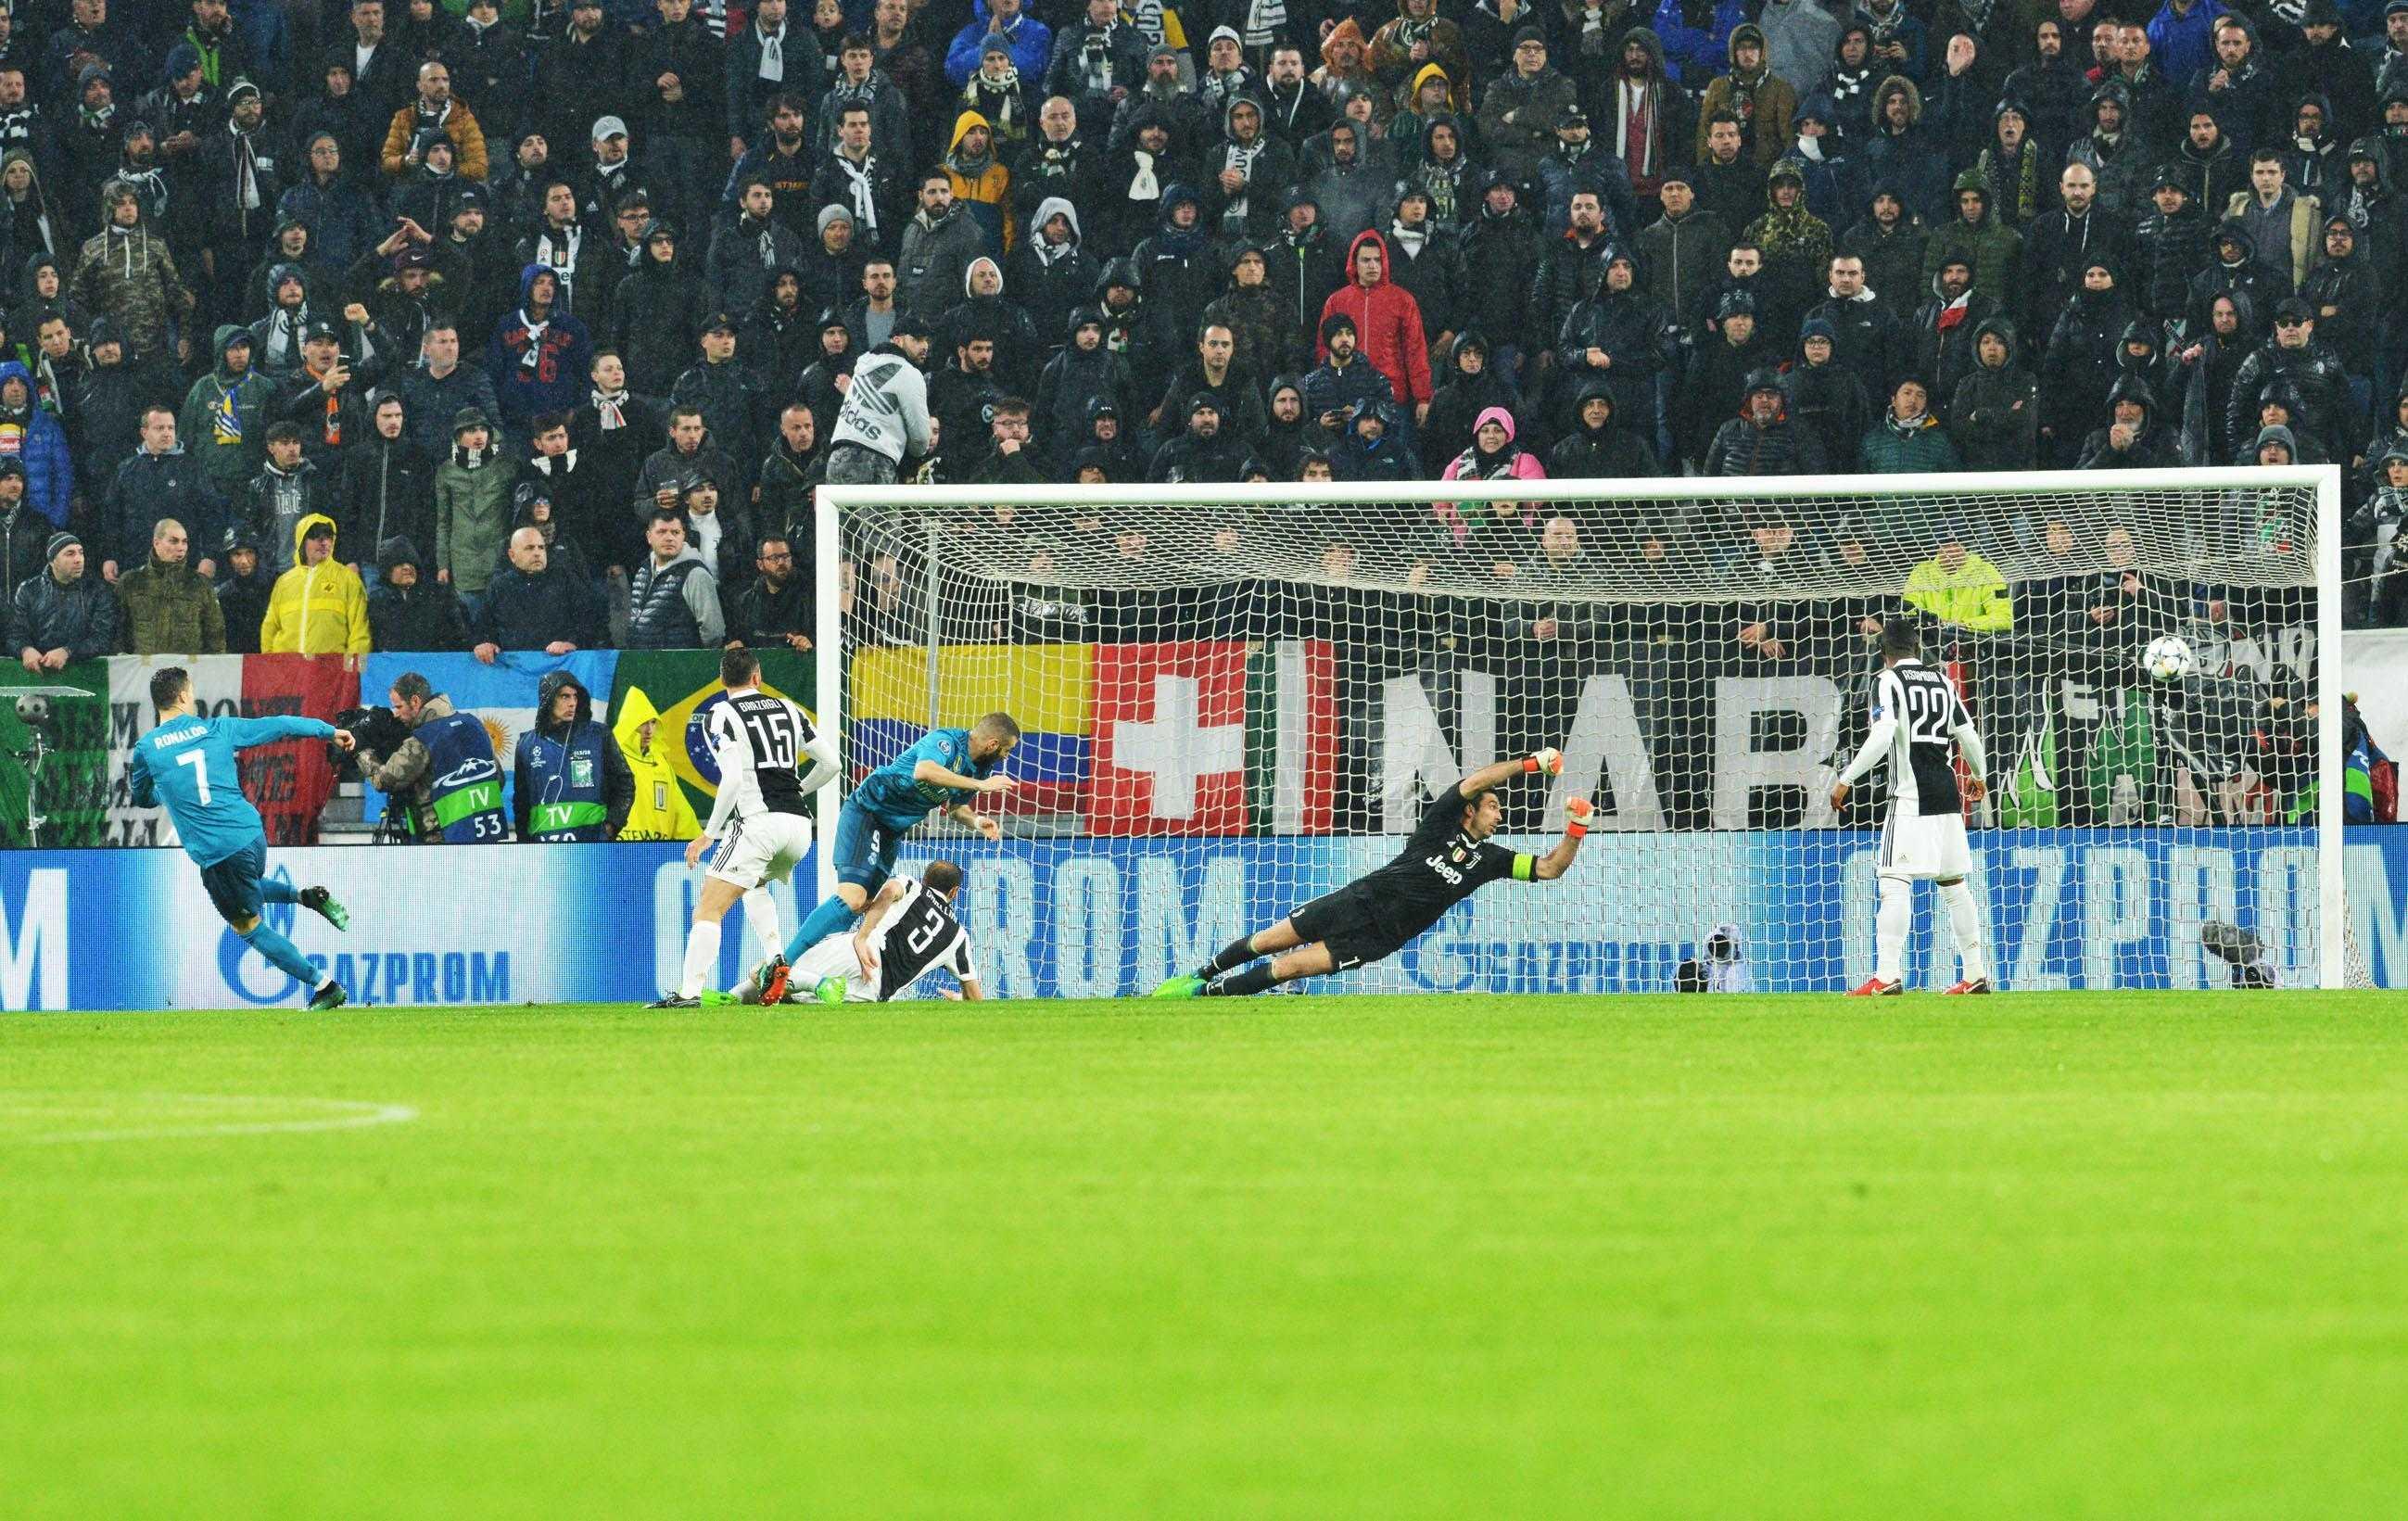 49de3032dc Rovesciata Cristiano Ronaldo all Allianz Stadium che applaude